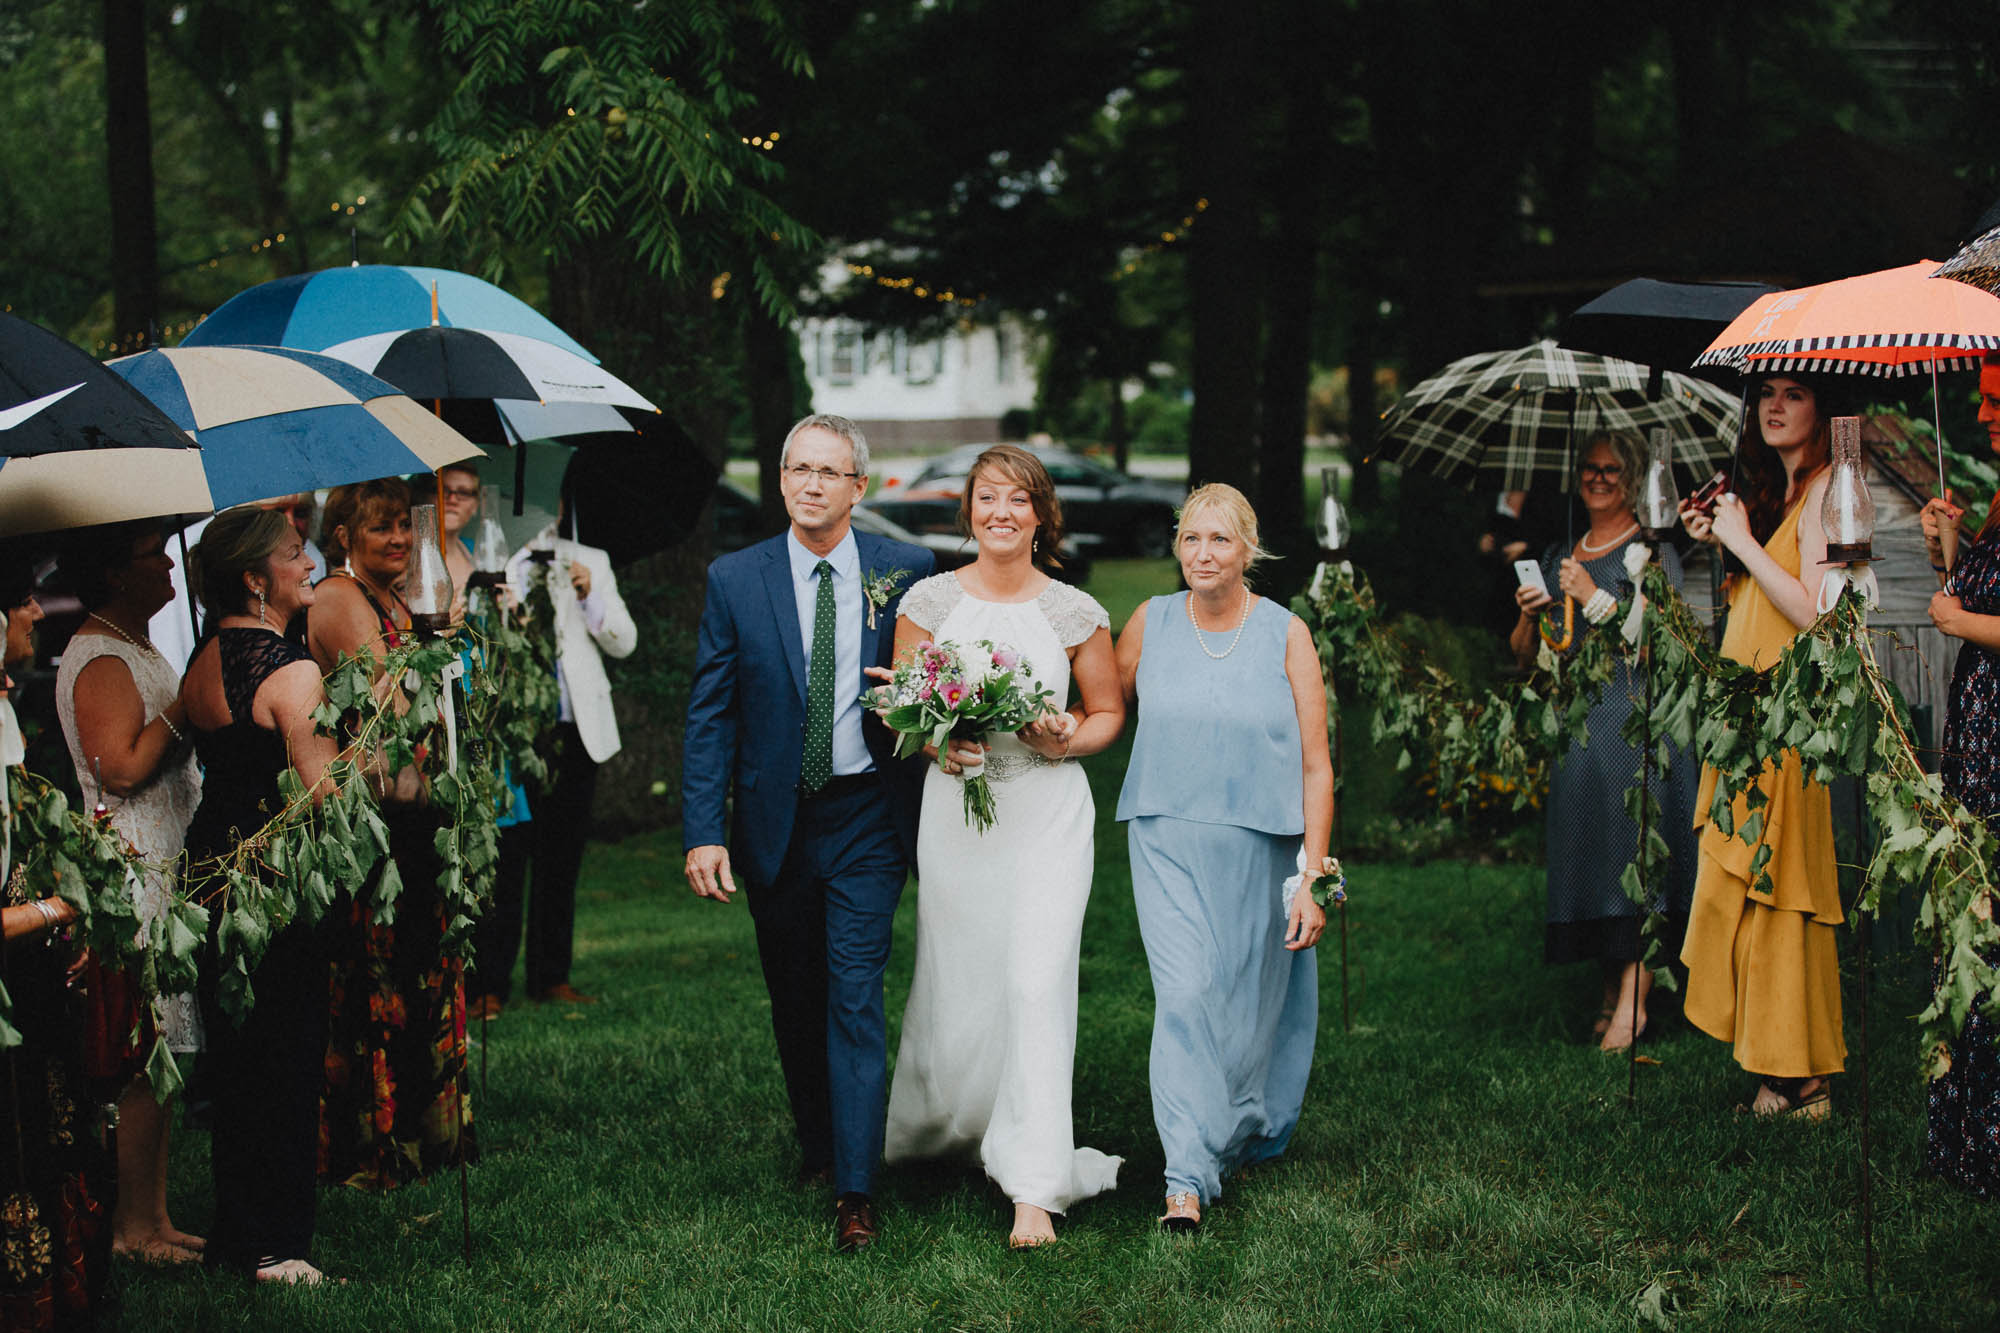 Leah-Graham-Michigan-Outdoor-DIY-Wedding-047@2x.jpg